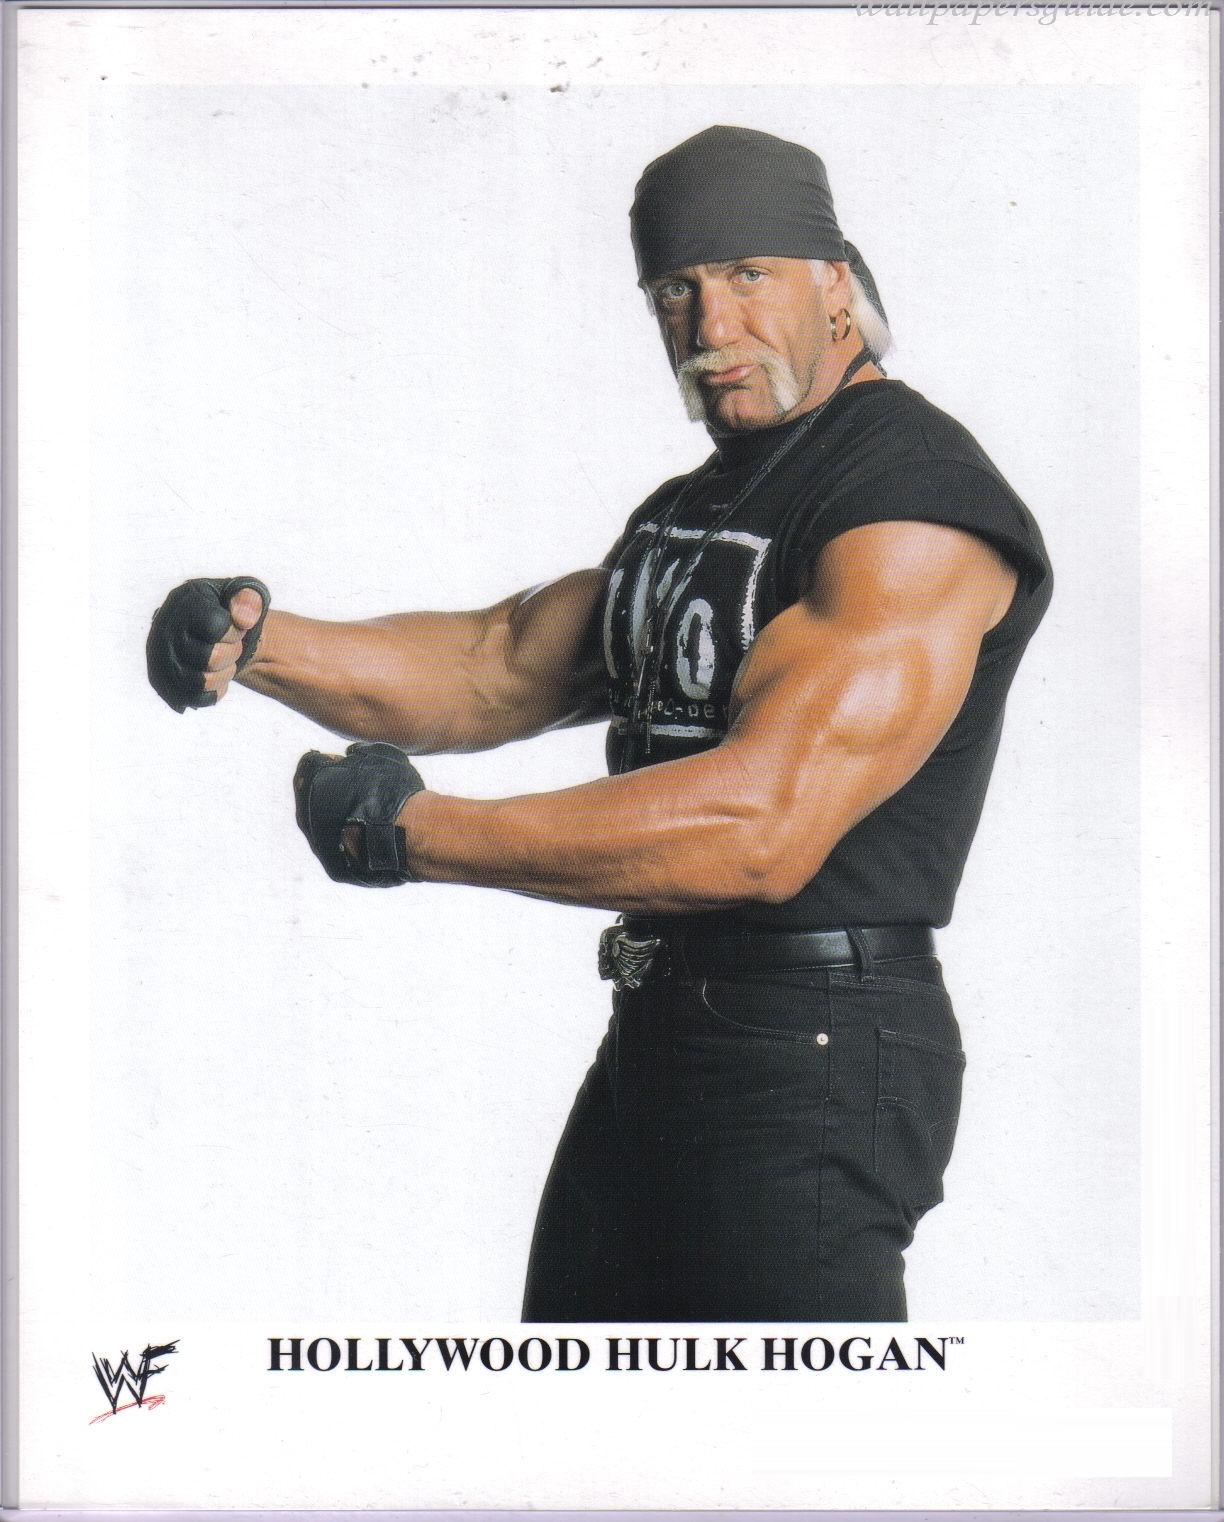 Hollywood Hulk Hogan Wallpapers  Cute Girls Celebrity Wallpaper